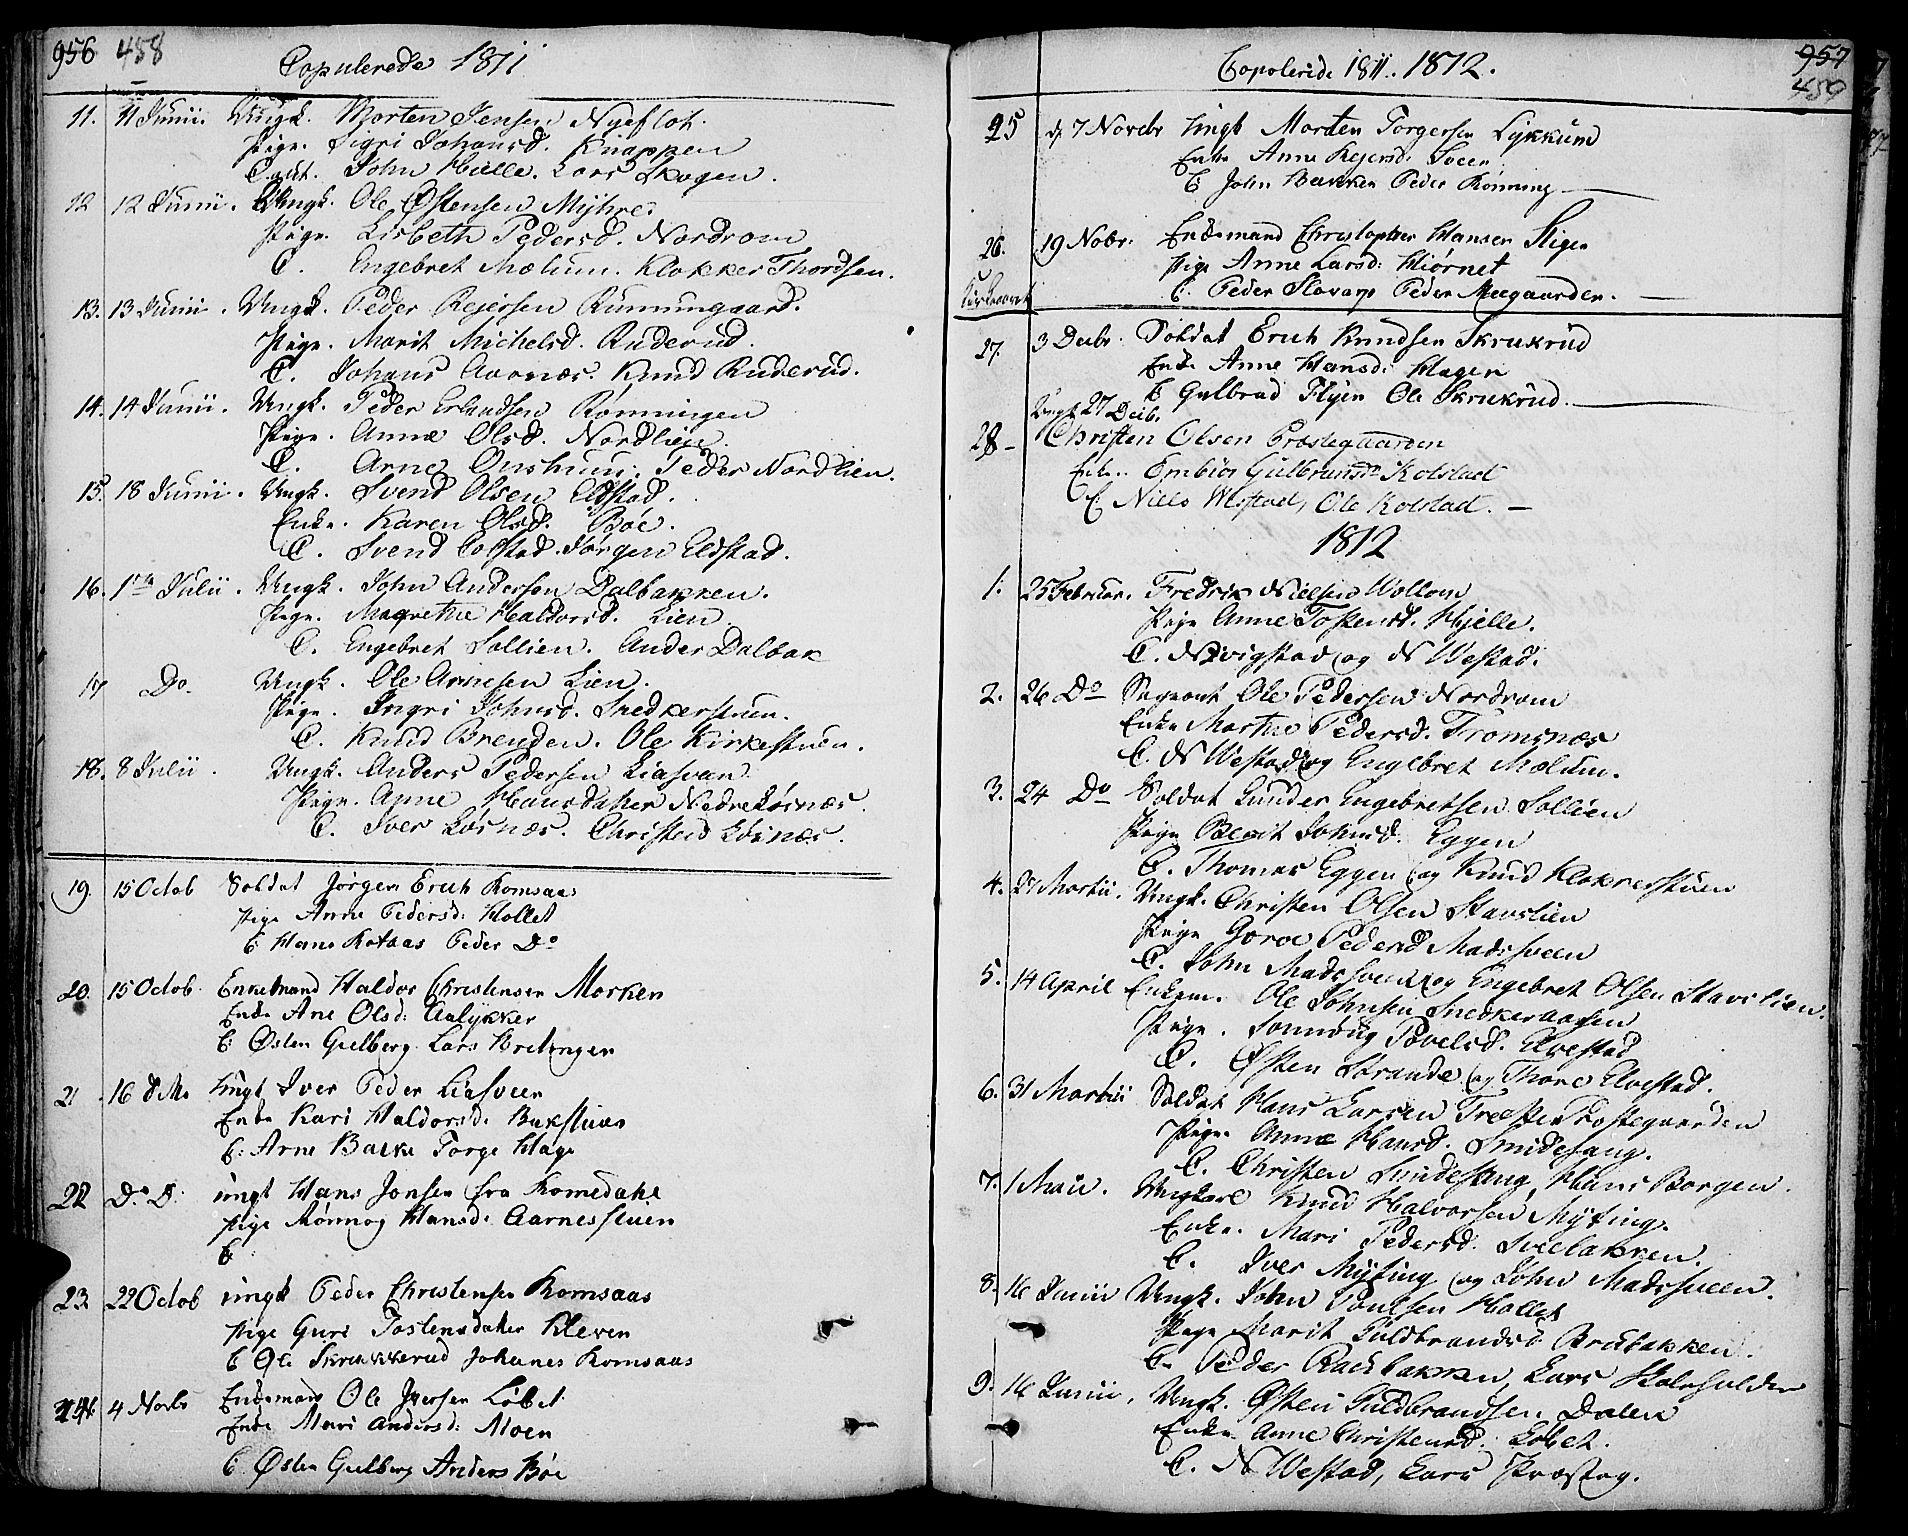 SAH, Ringebu prestekontor, Ministerialbok nr. 3, 1781-1820, s. 458-459